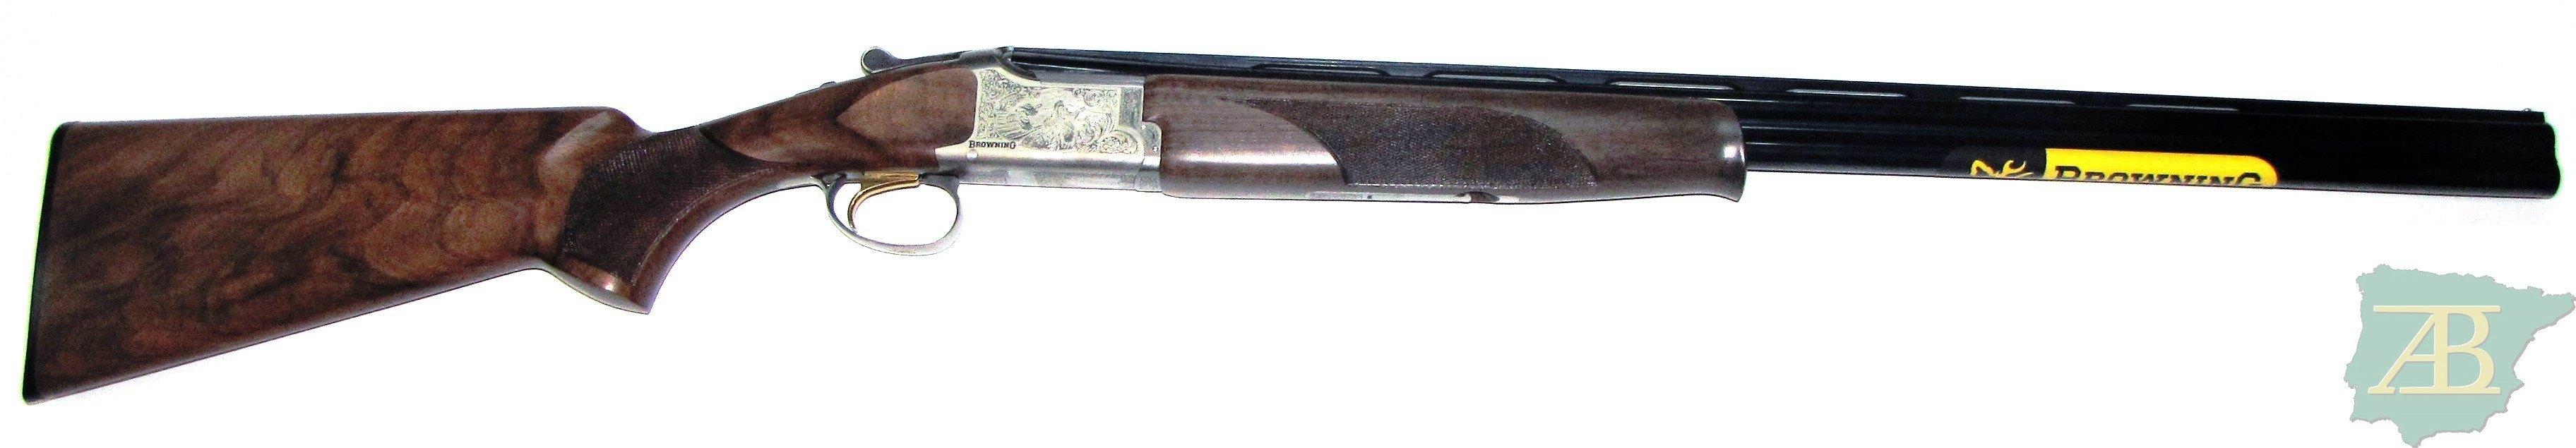 ESCOPETA SUPERPUESTA DE CAZA BROWNING B525L